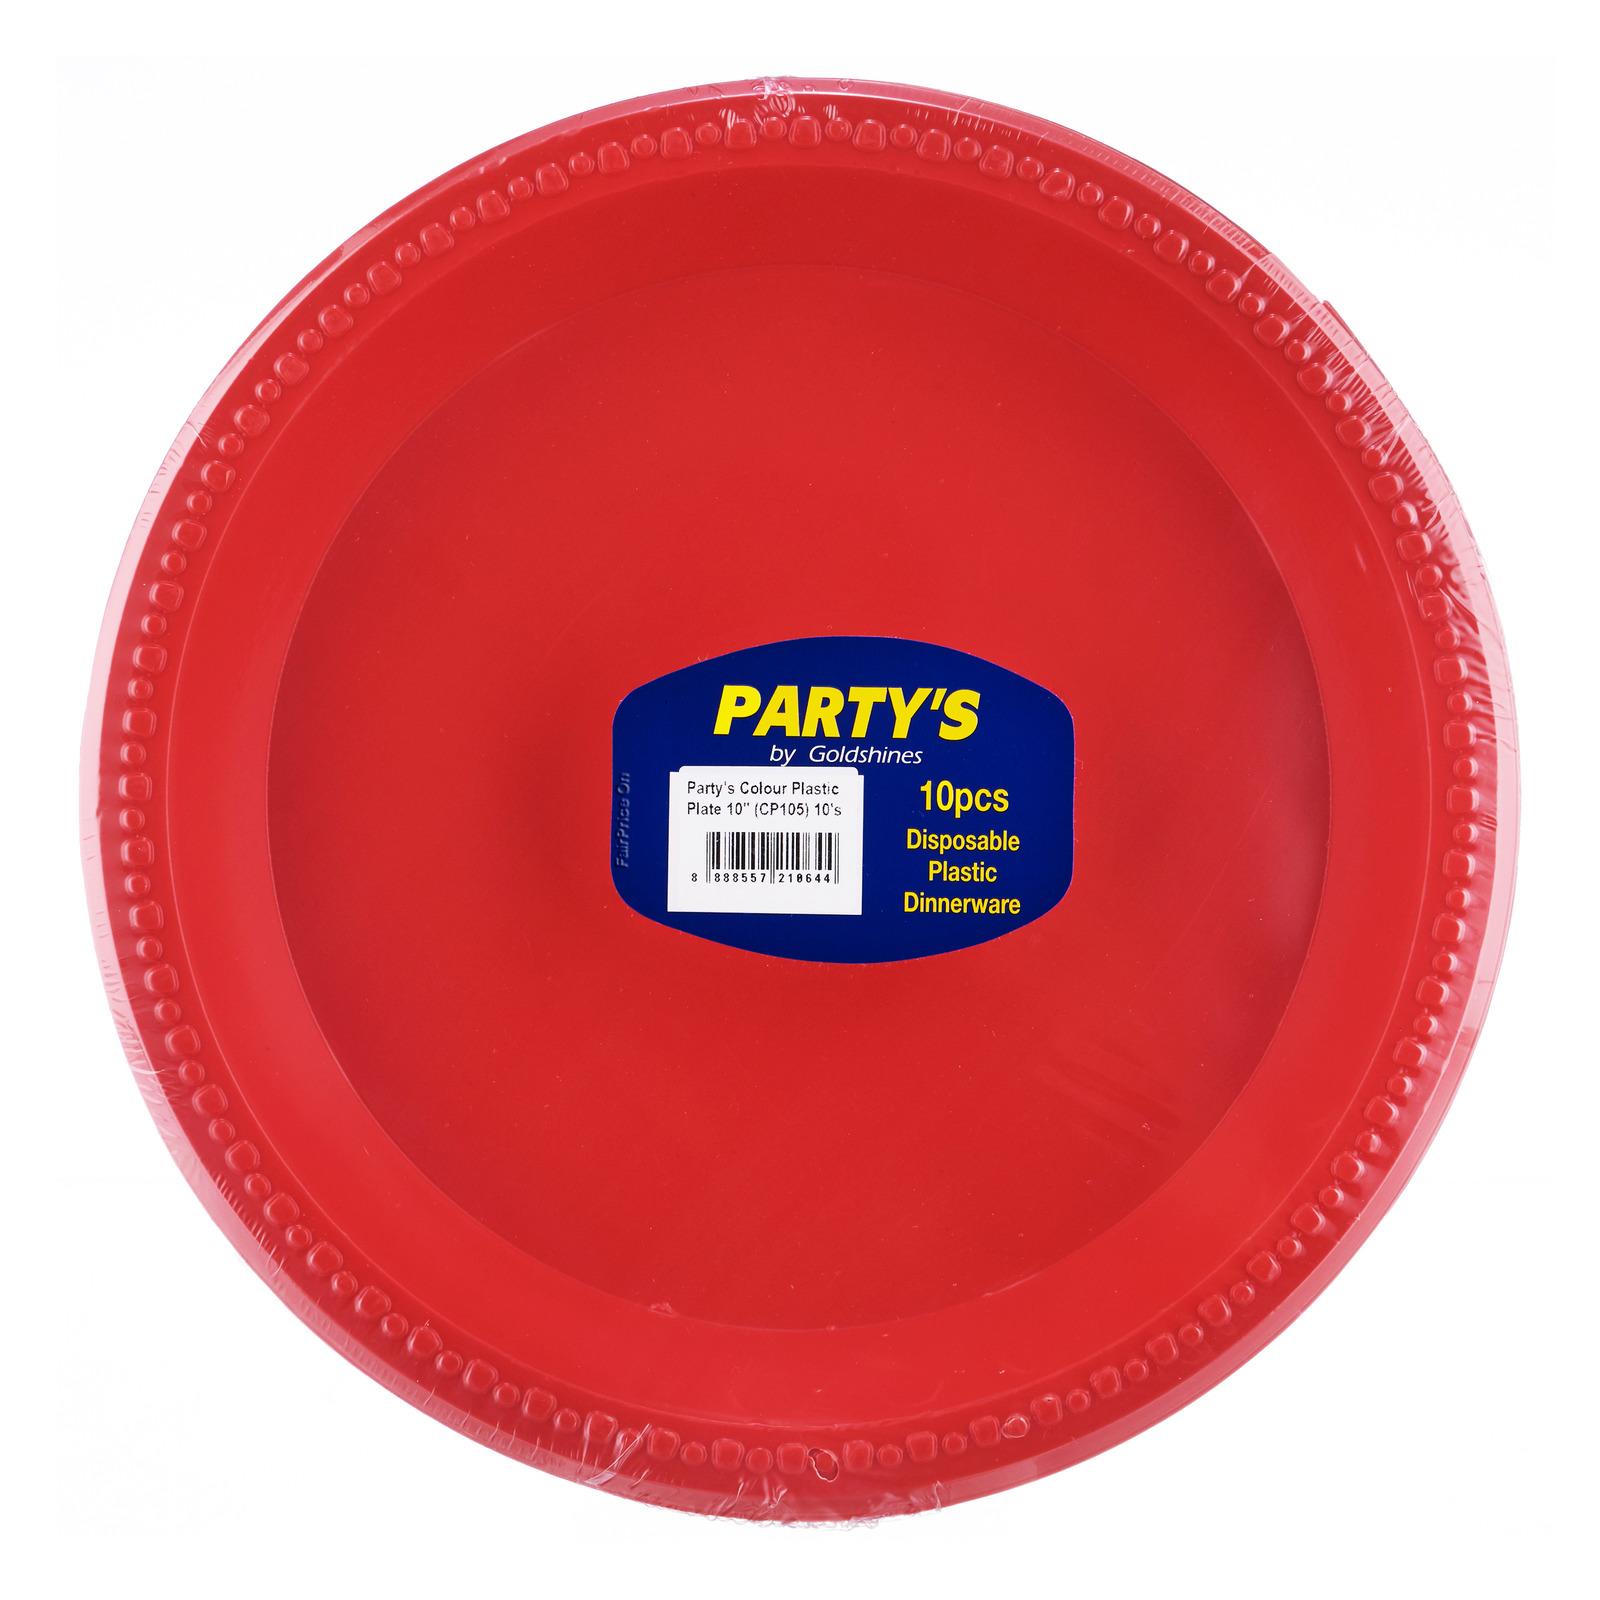 Party's Disposable Plastic Dinnerware - Colour Plates